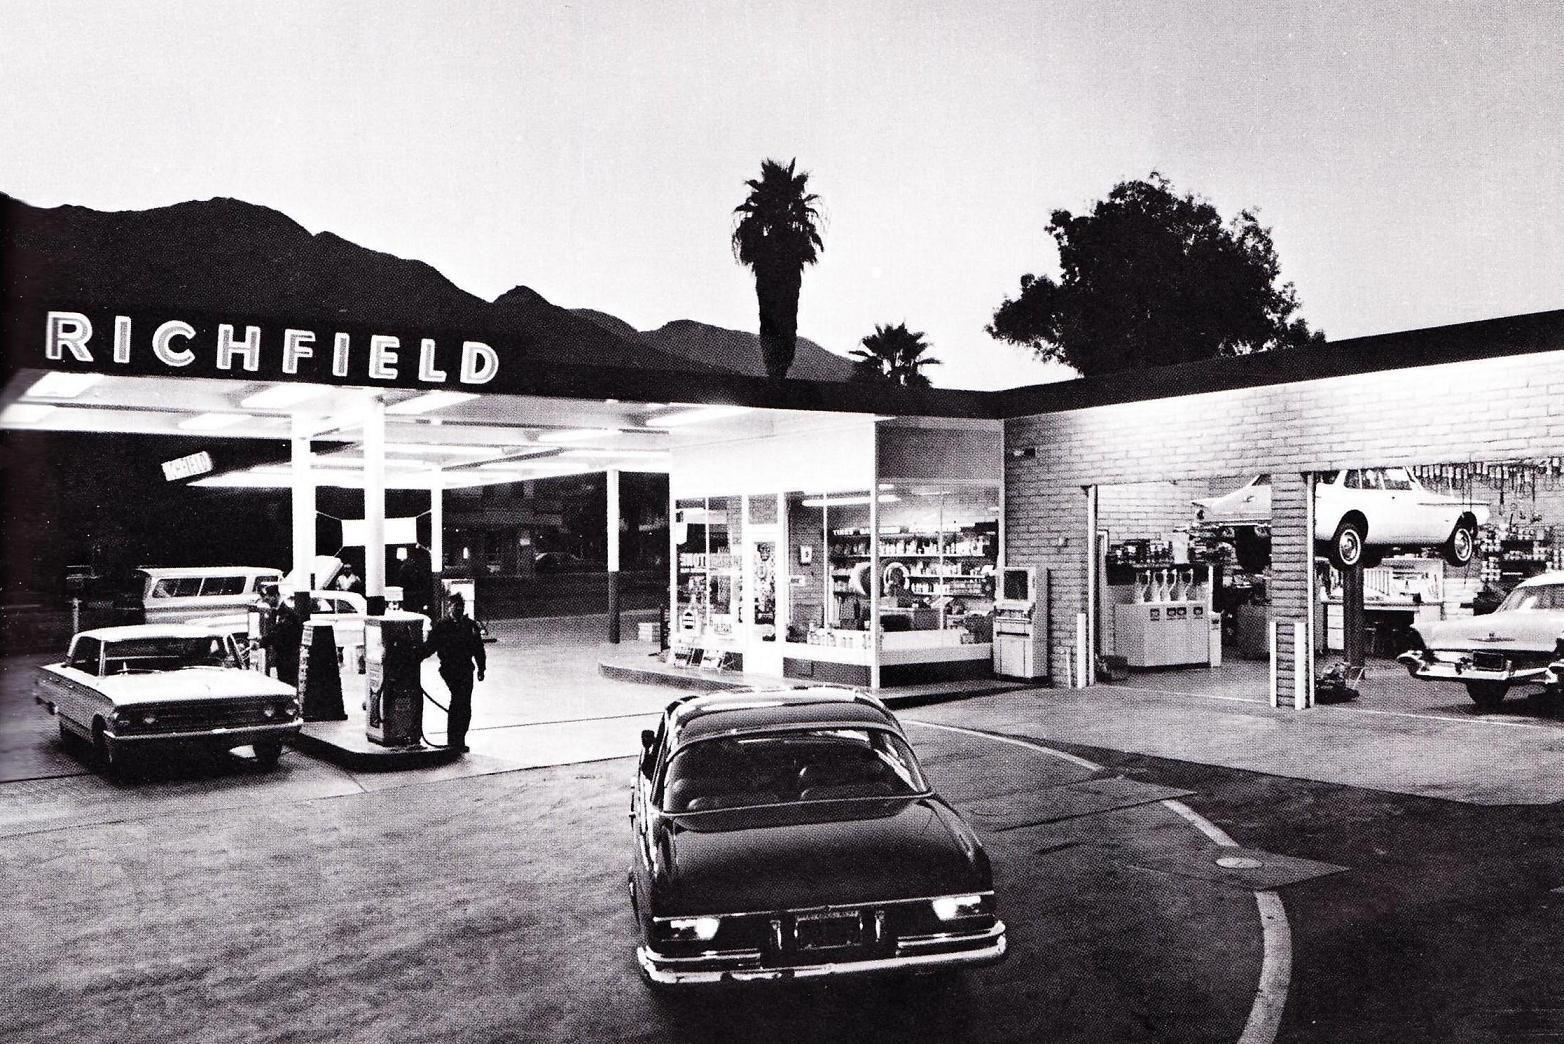 gas pump 1963 30 cents per gallon Gas station